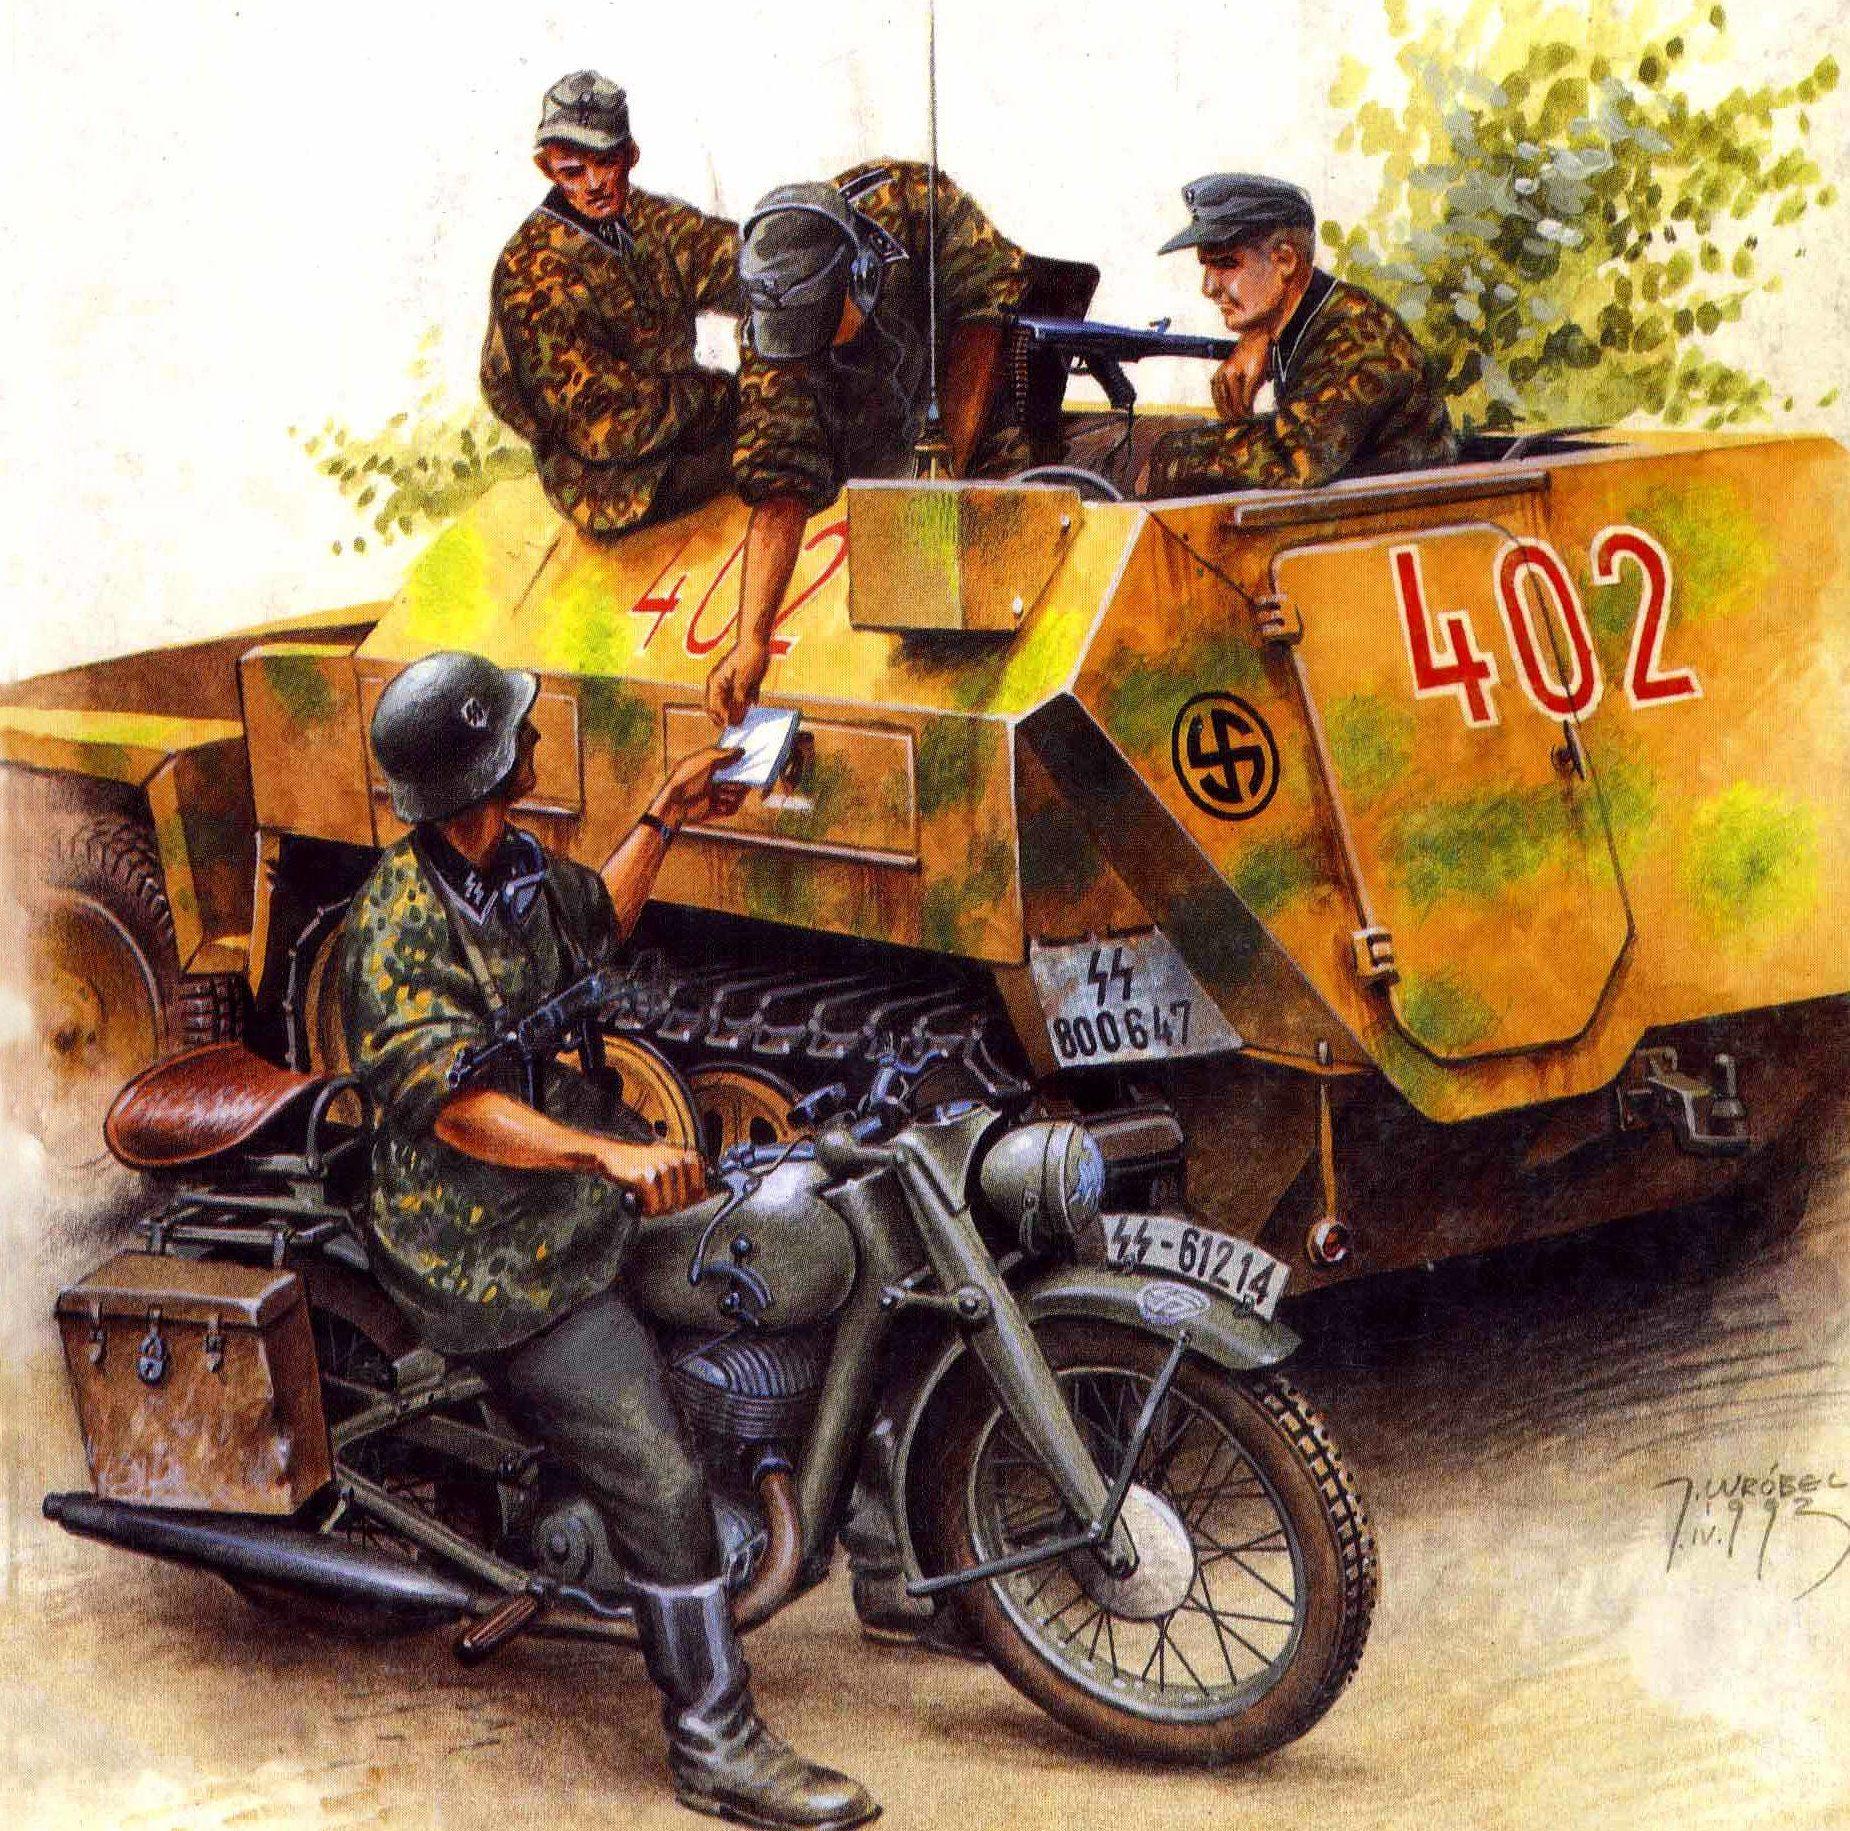 Wrobel Jaroslaw. Бронеавтомобиль Sd.kfz. 250.